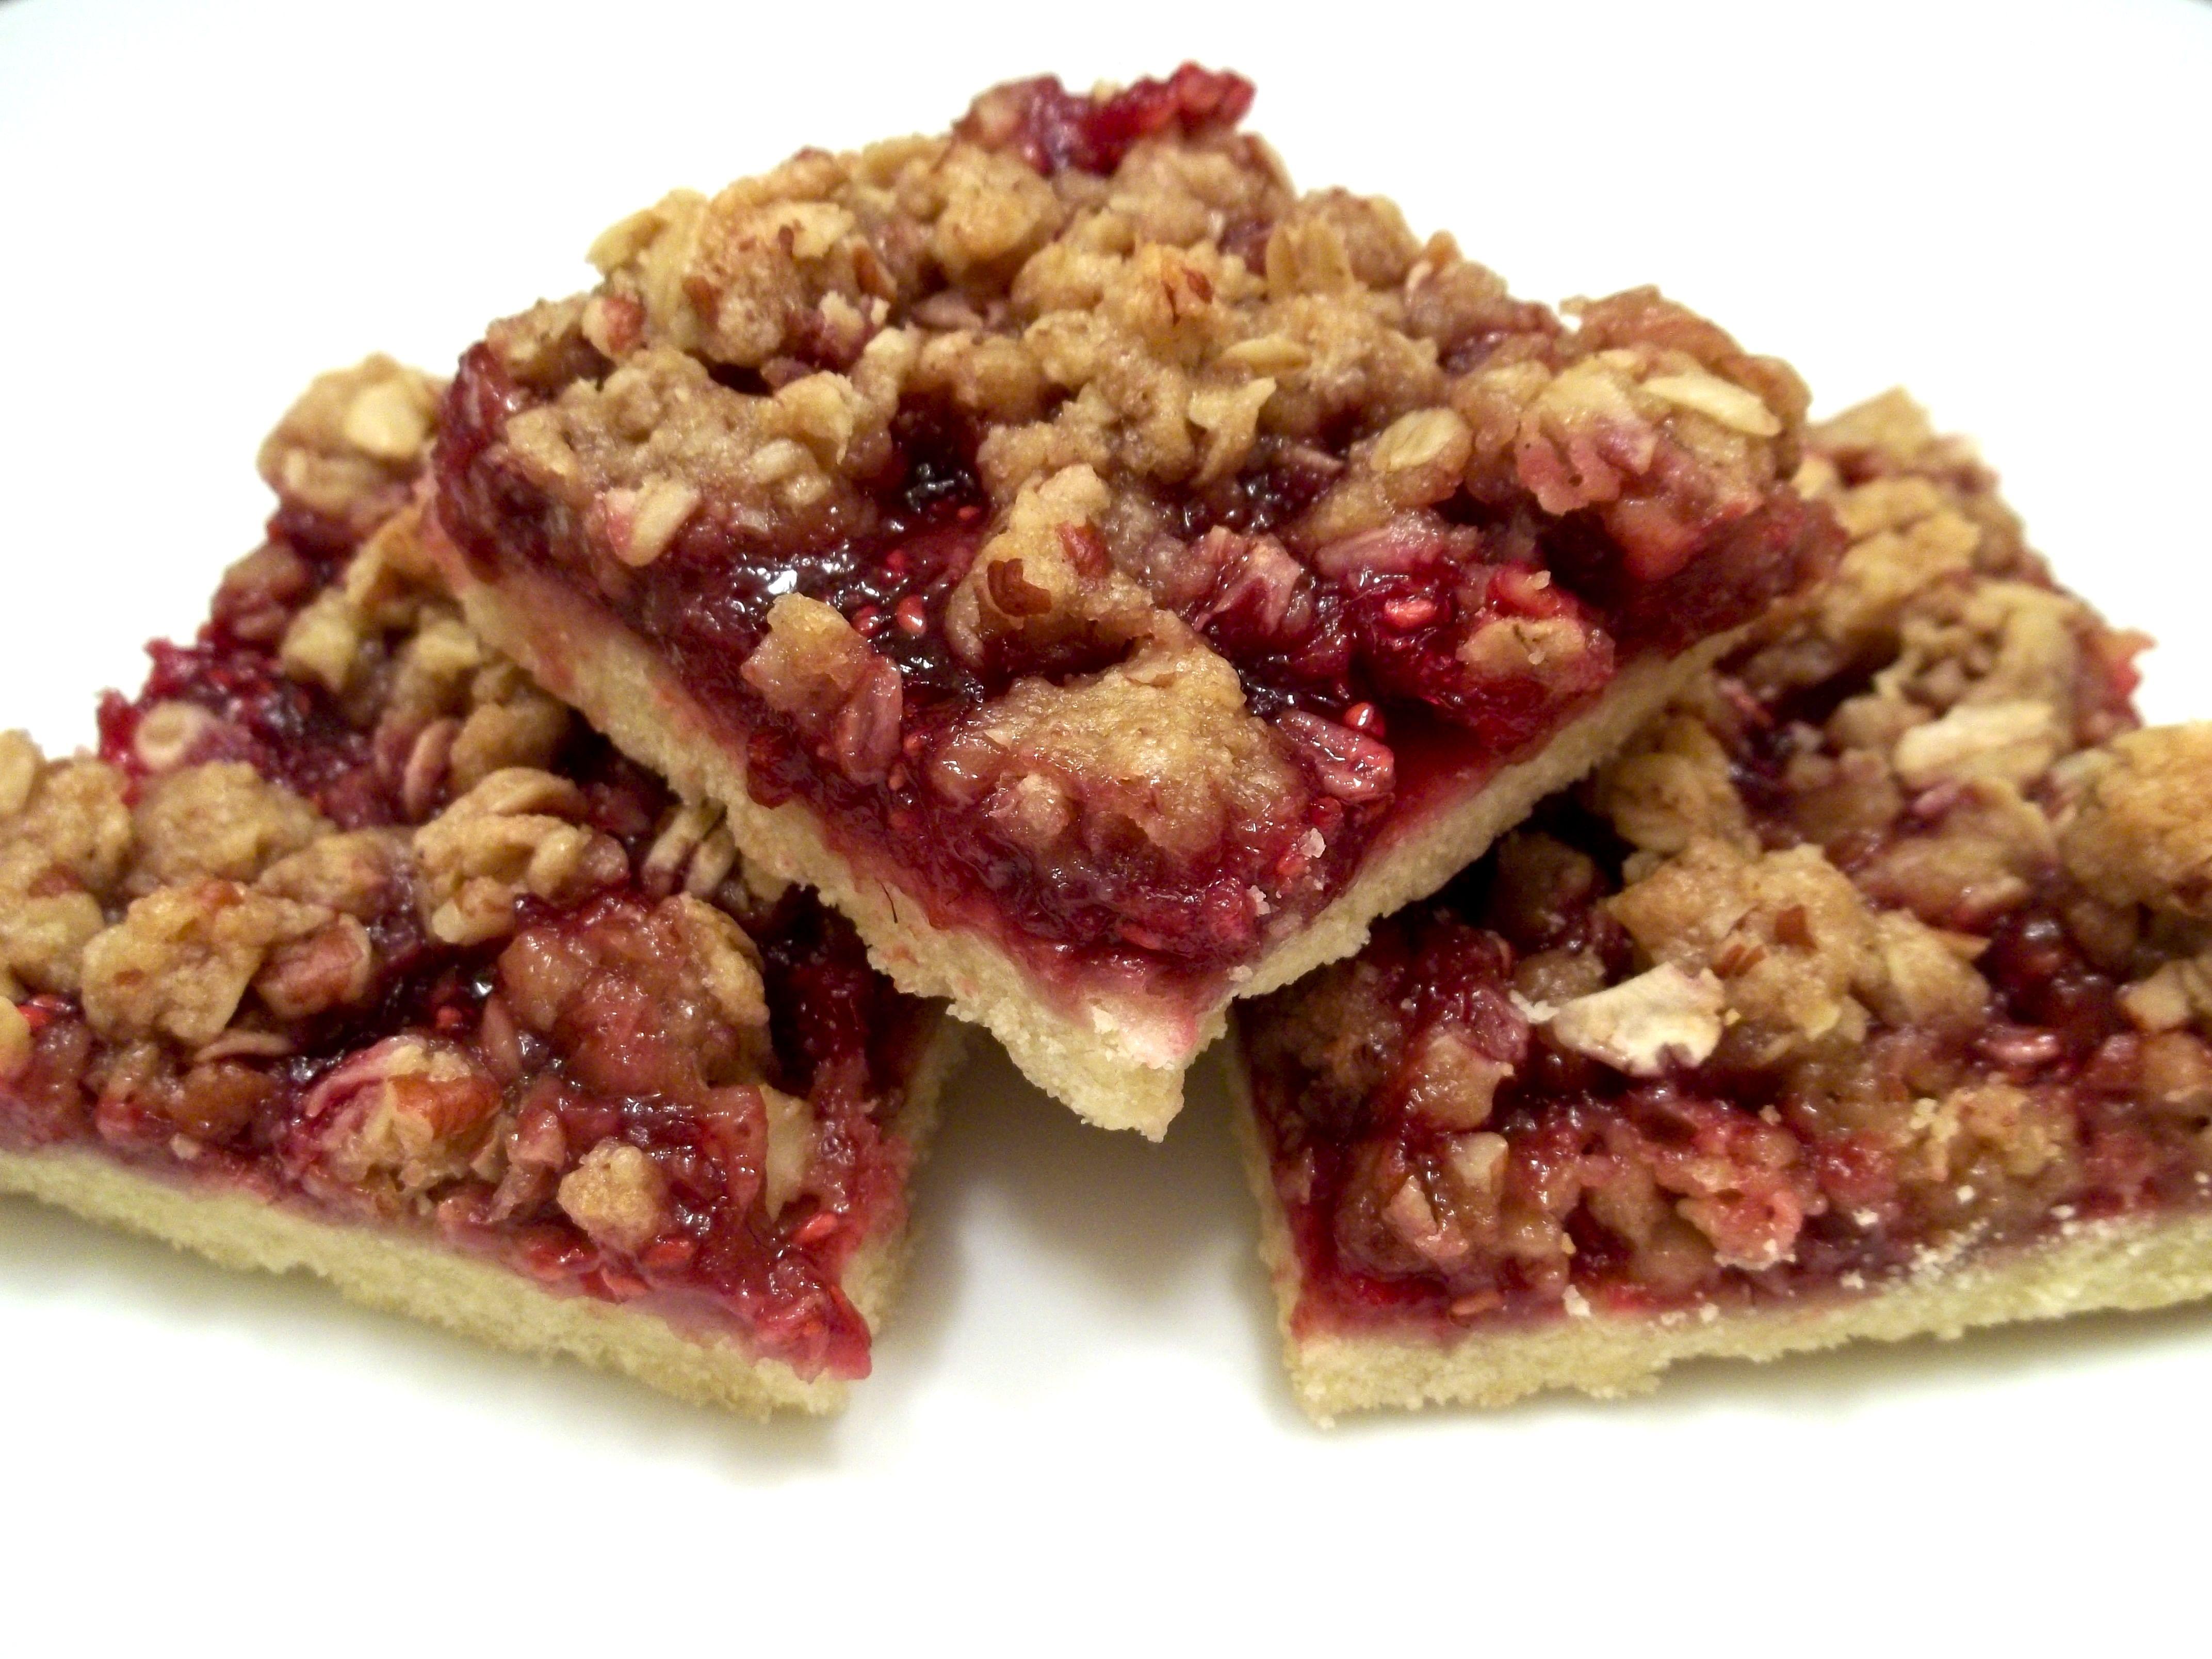 Raspberry streusel bars | Yum! | Pinterest